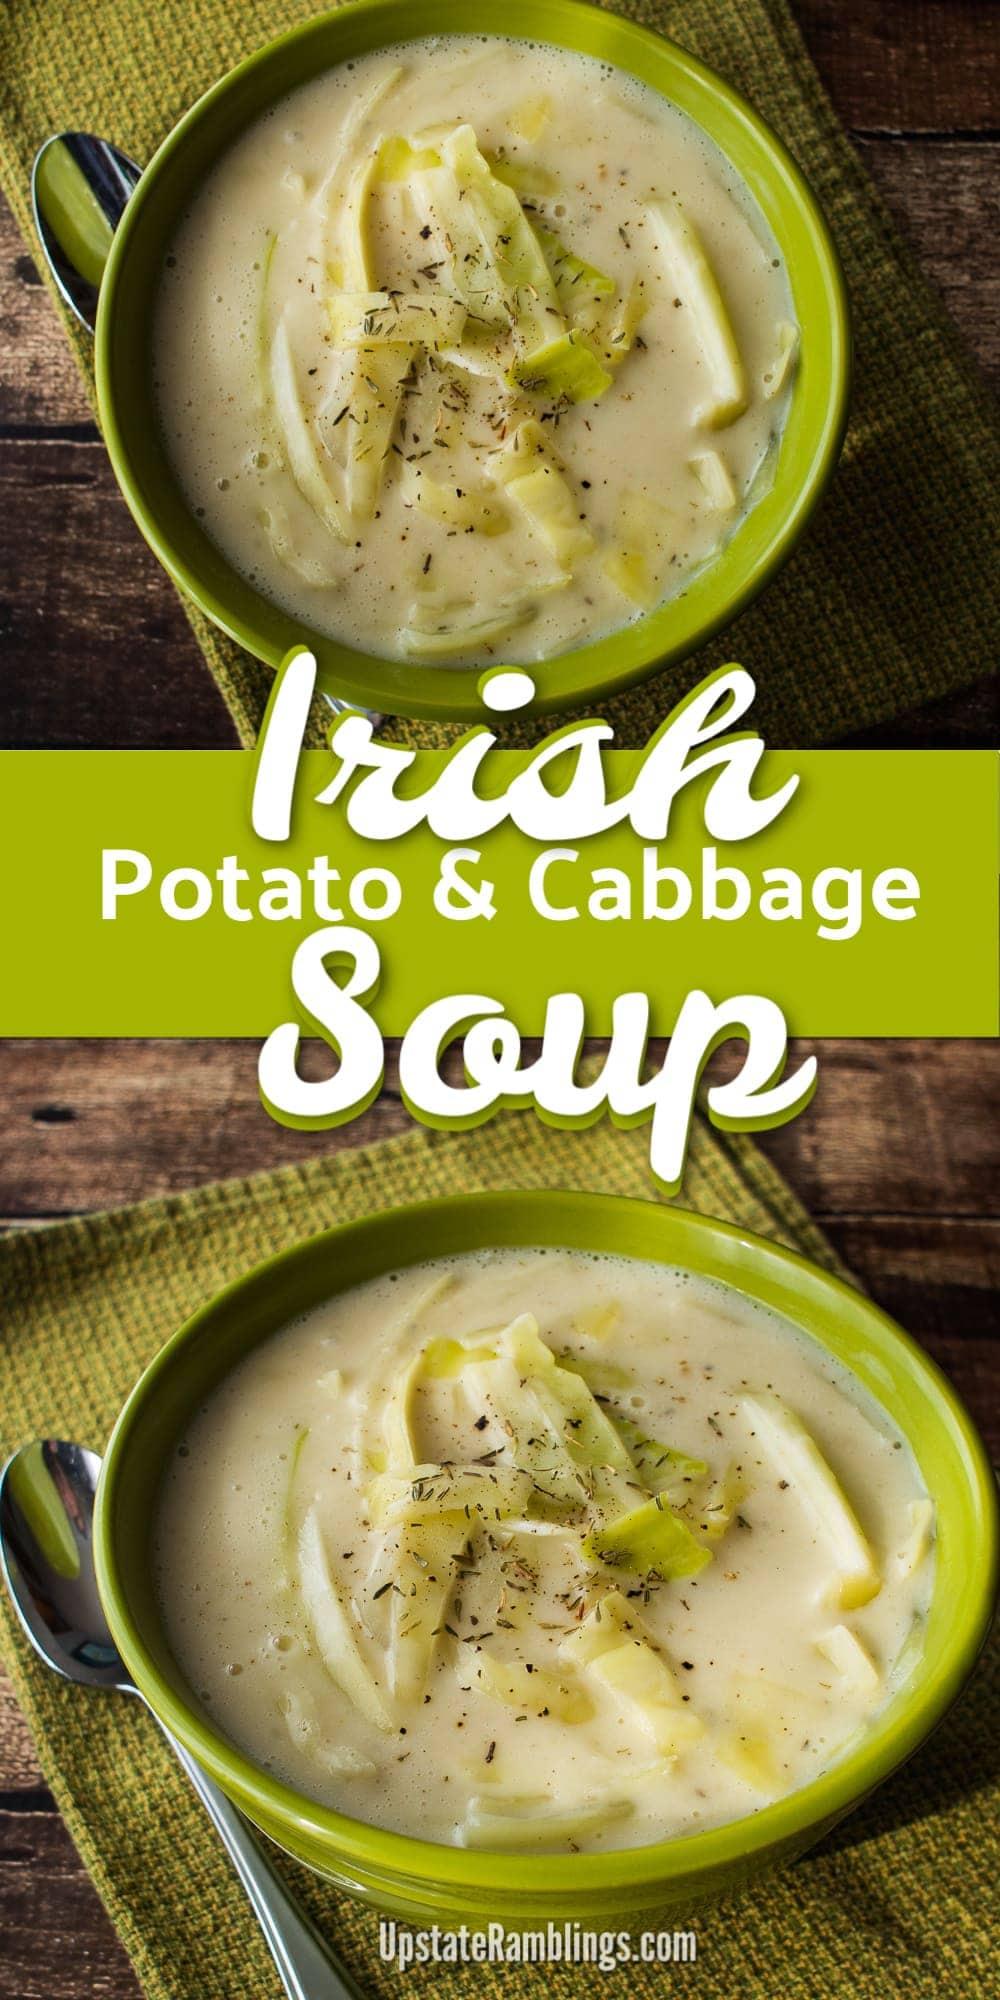 Irish Colcannon Soup Recipe - This creamy Irish Potato Soup is made from potatoes mixed with cabbage for an Irish inspired meatless soup for Lent #Irish #Irishrecipes #stpatricksday #potatosoup